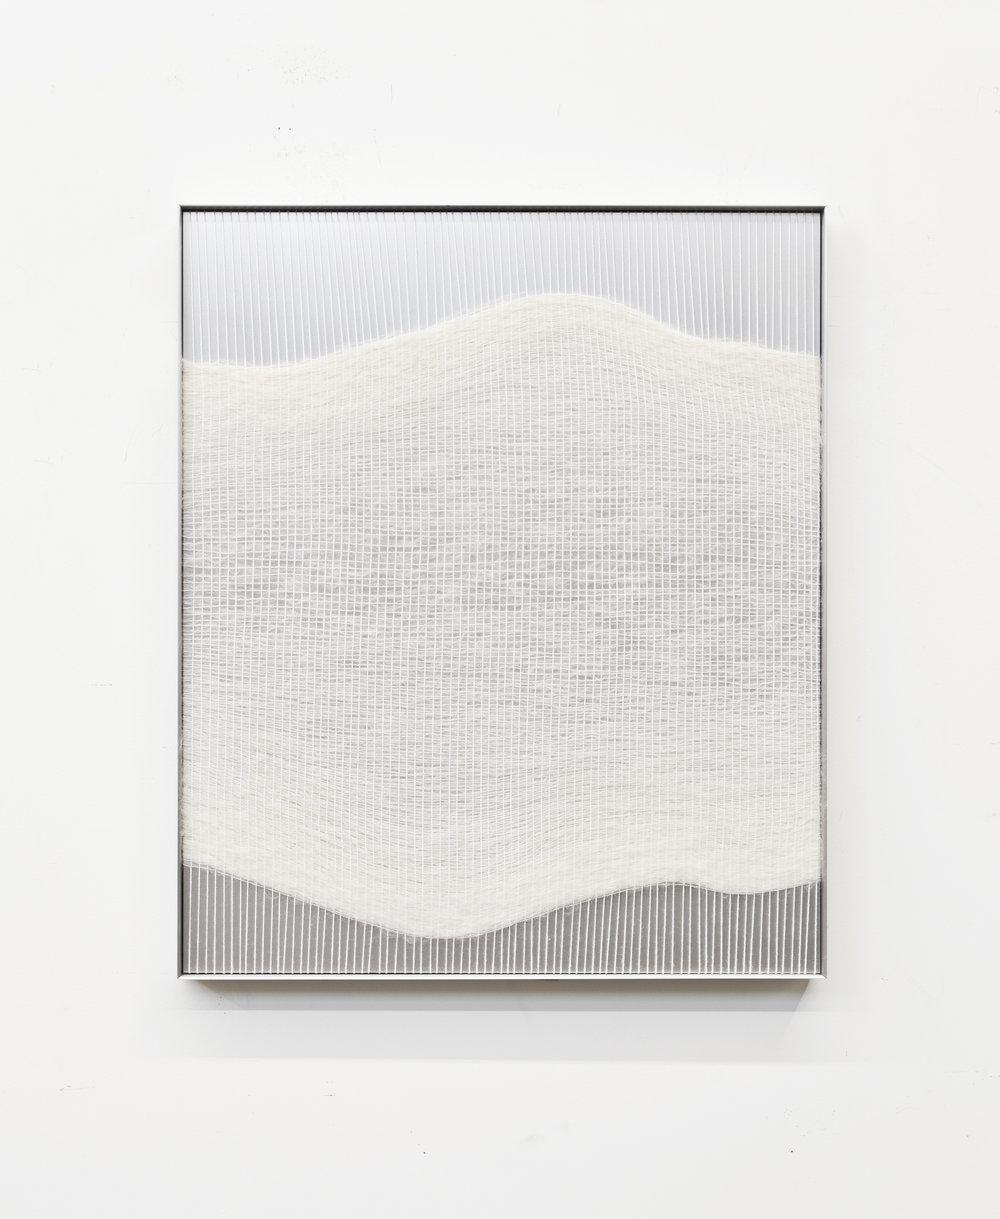 Mimi Jung - White Live Edge Form, 2018